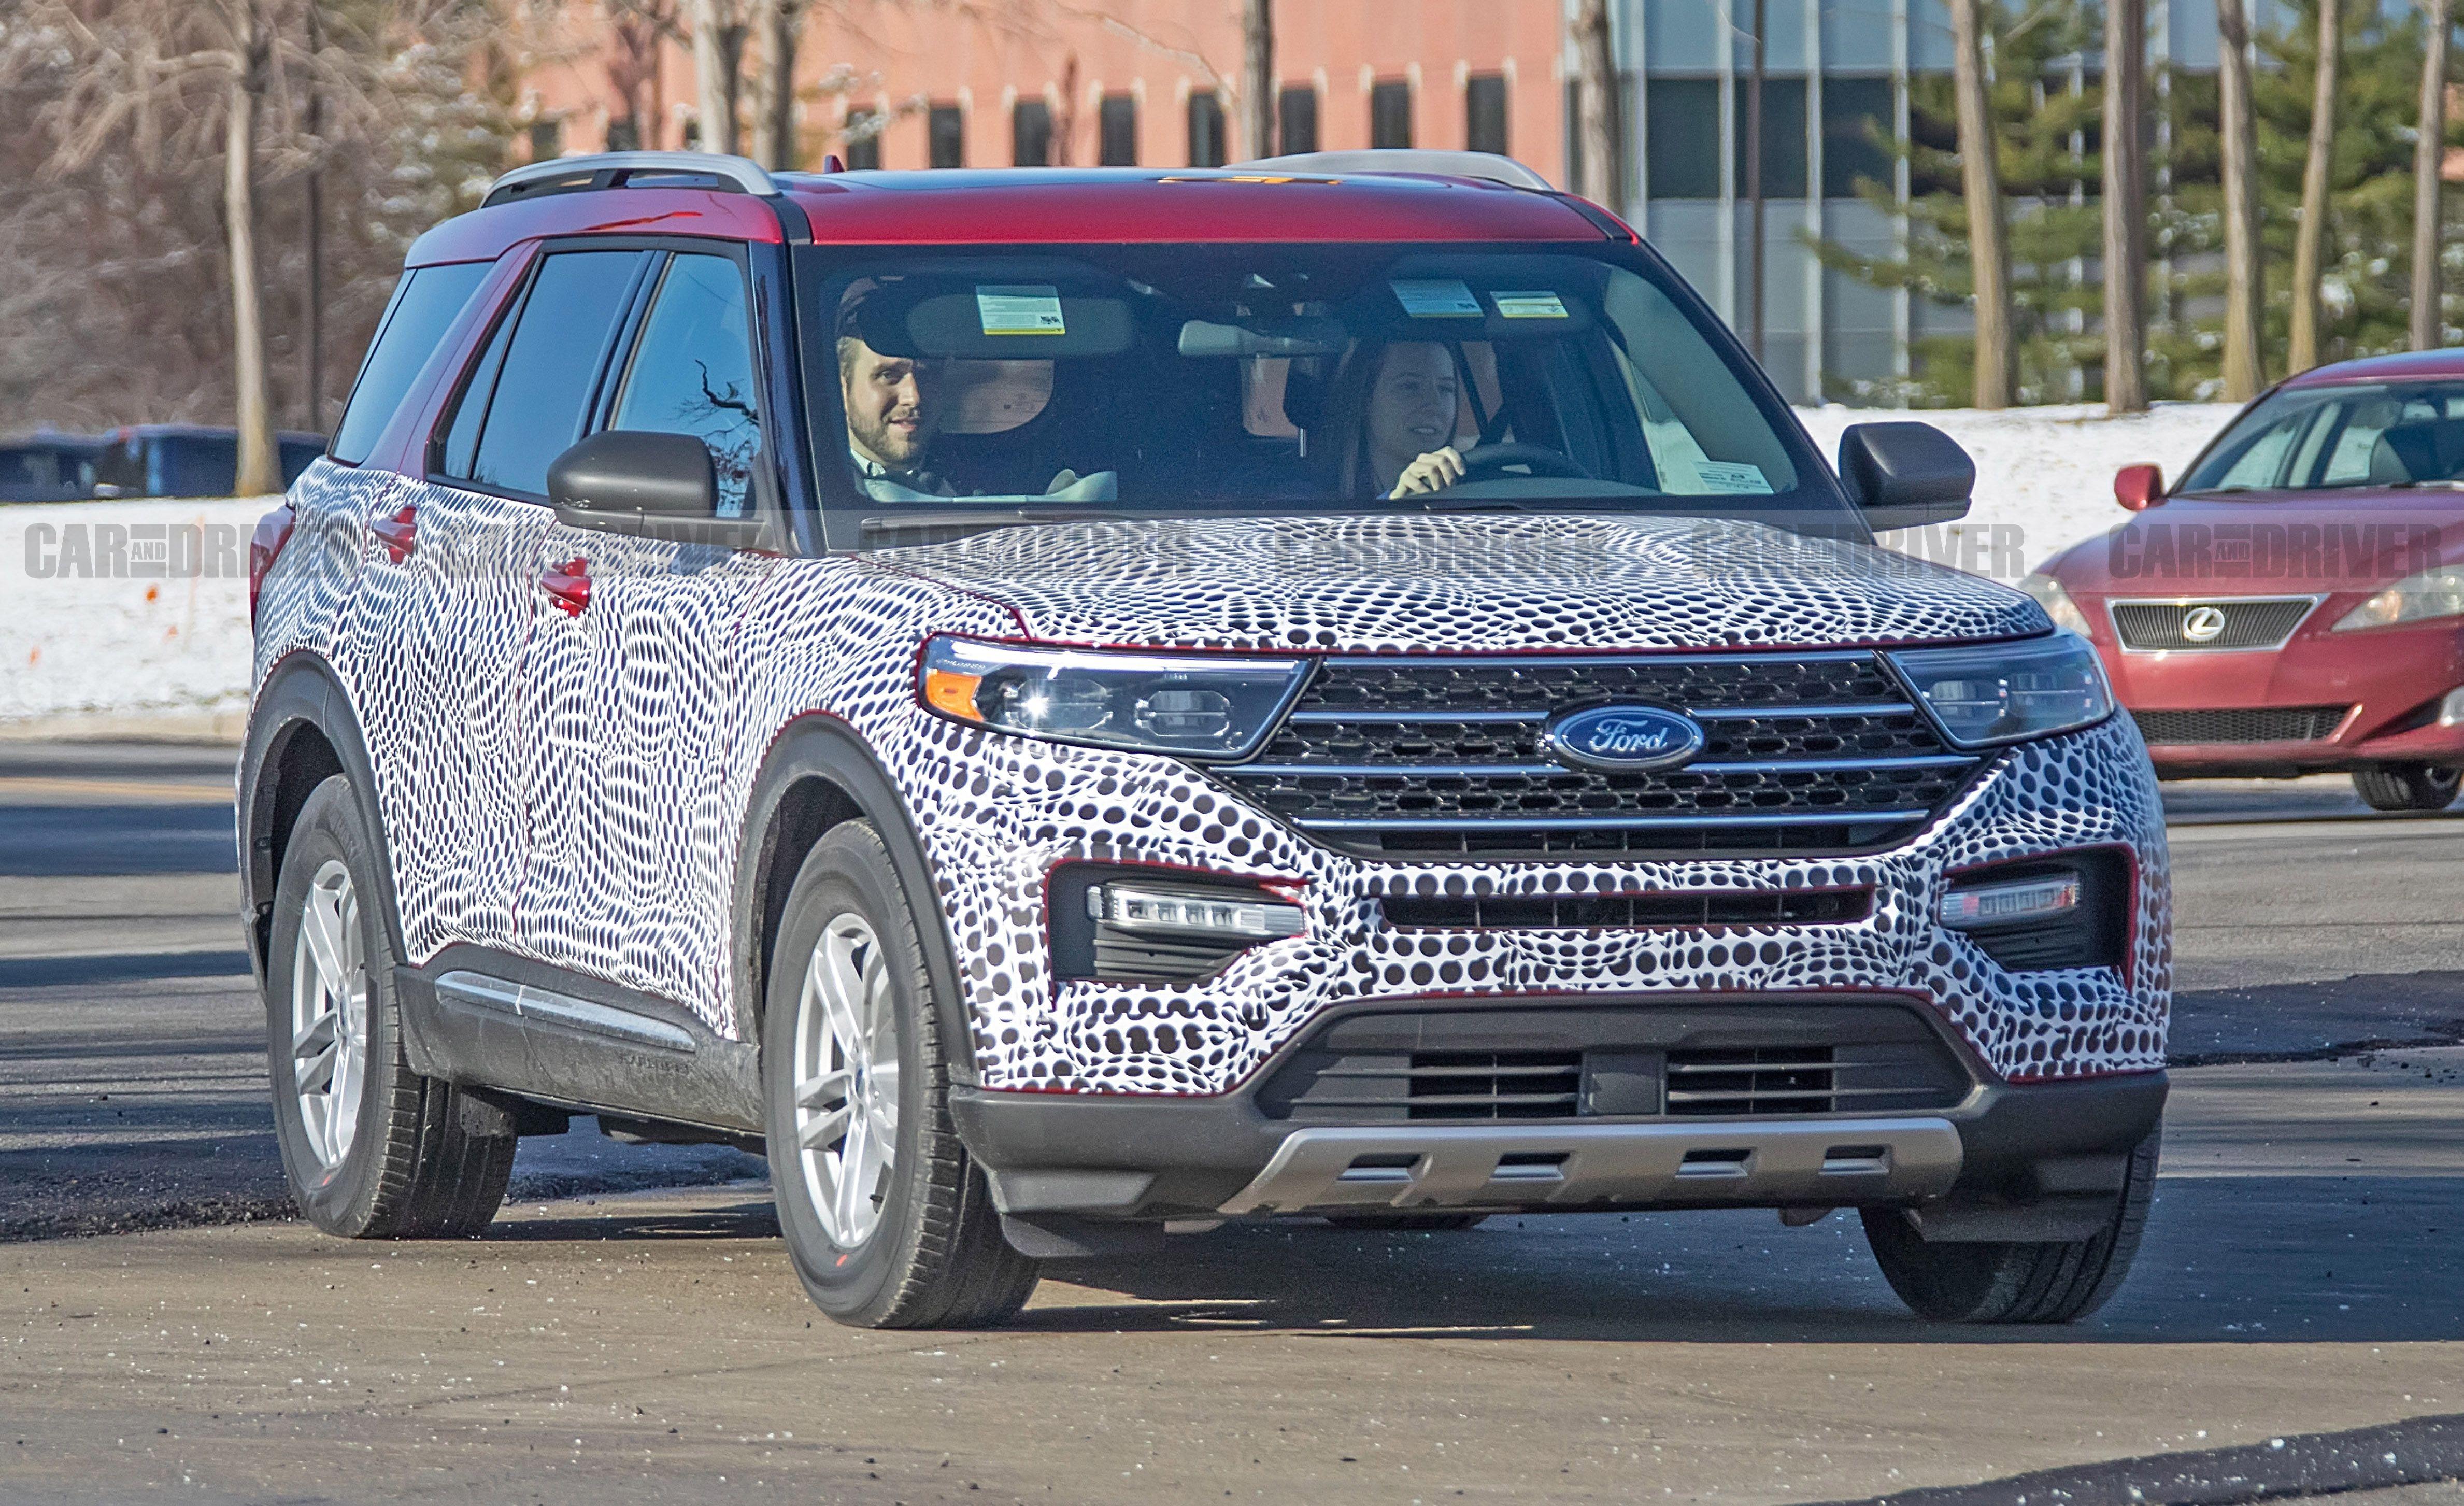 2020 Ford Explorer Reviews Ford Explorer Price Photos And Specs